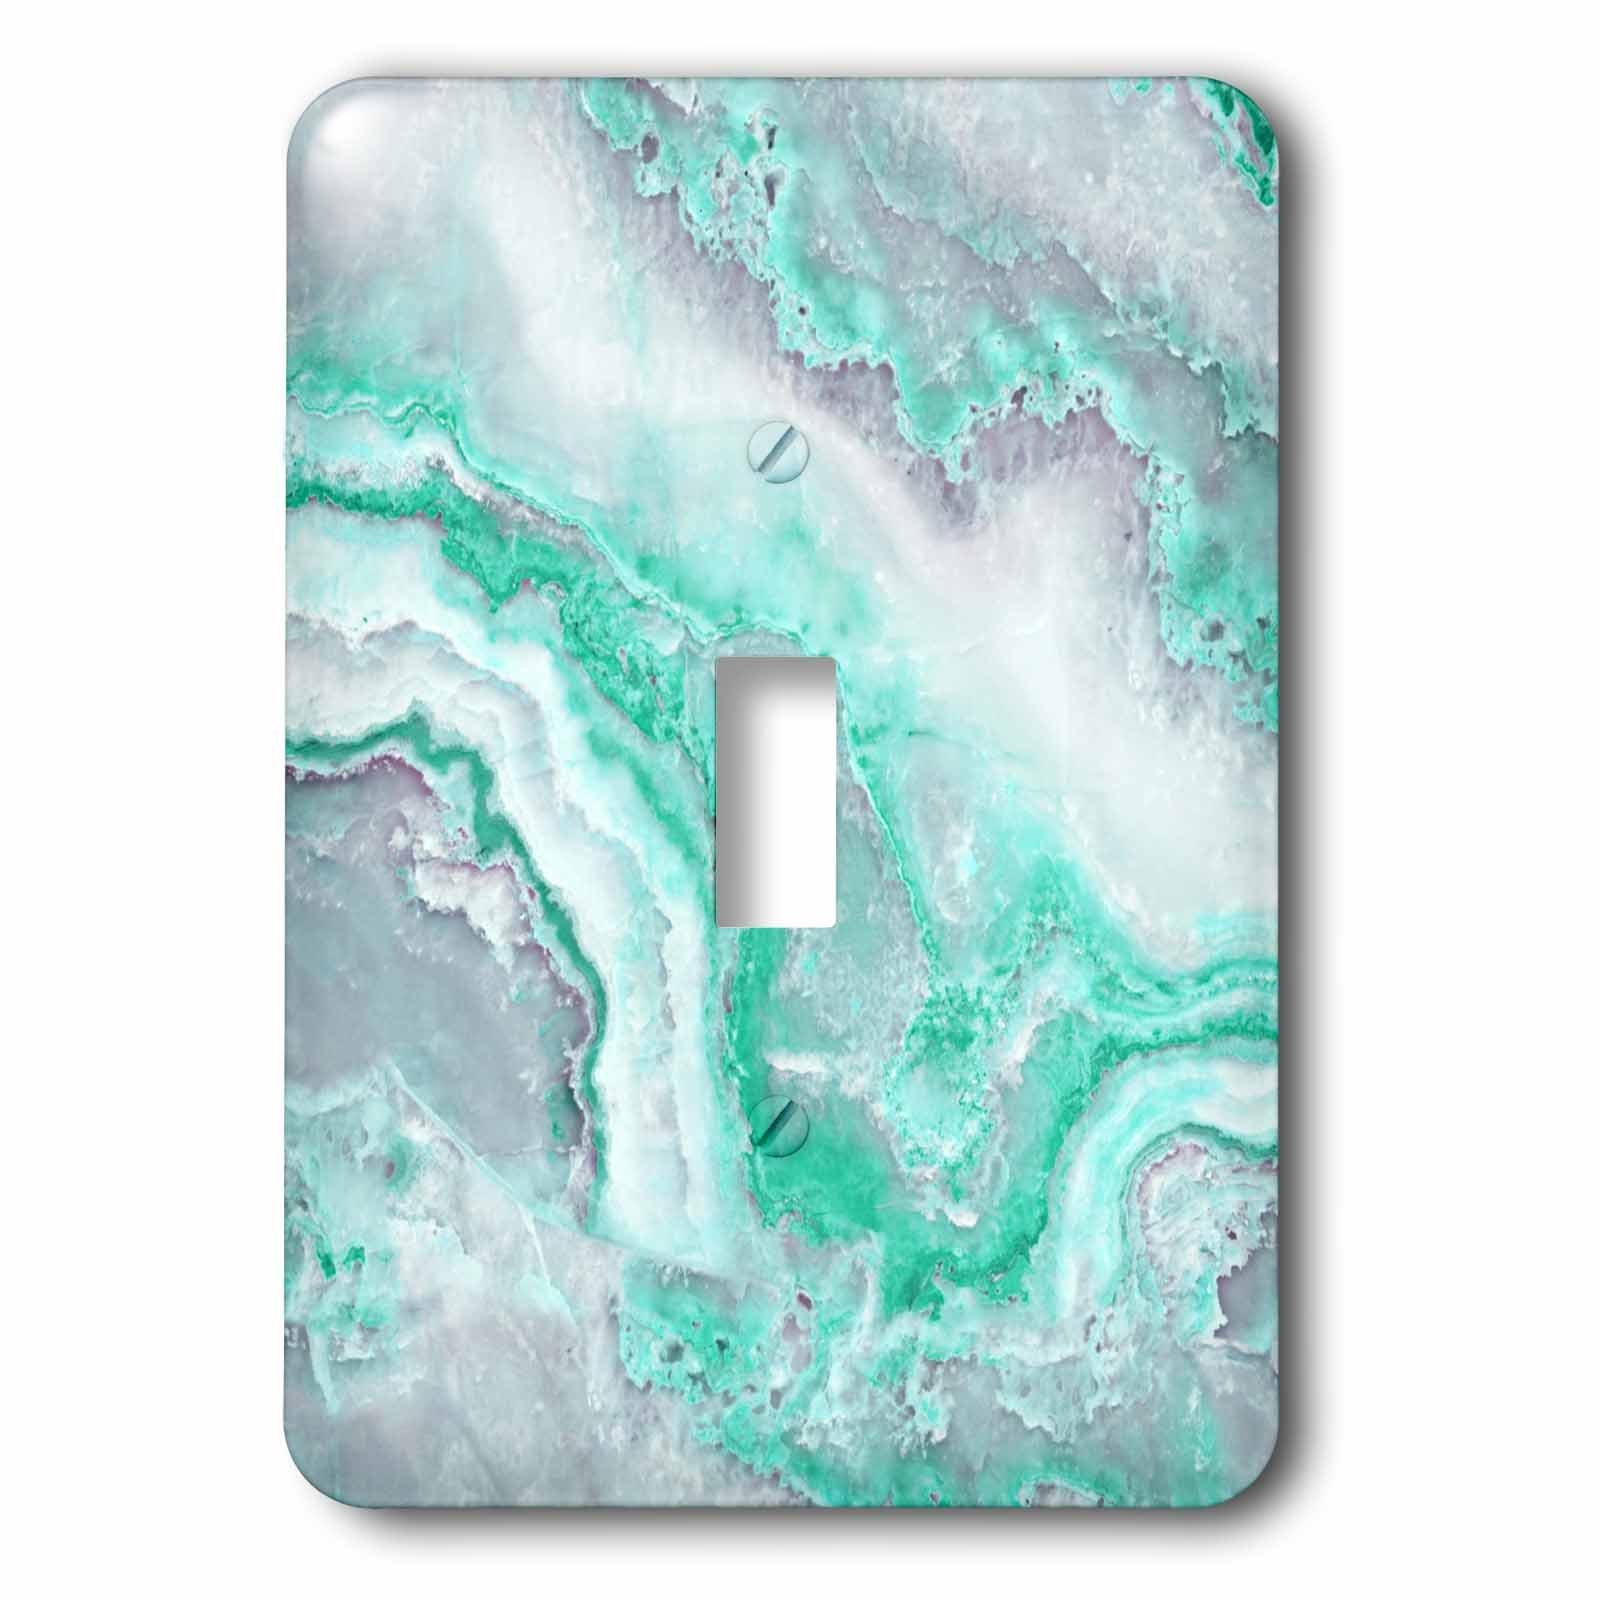 3dRose Uta Naumann Faux Glitter Pattern - Image of Trendy Luxury Aqua Mint Quartz and Gray Gemstone Agate Geode - Light Switch Covers - single toggle switch (lsp_275123_1)